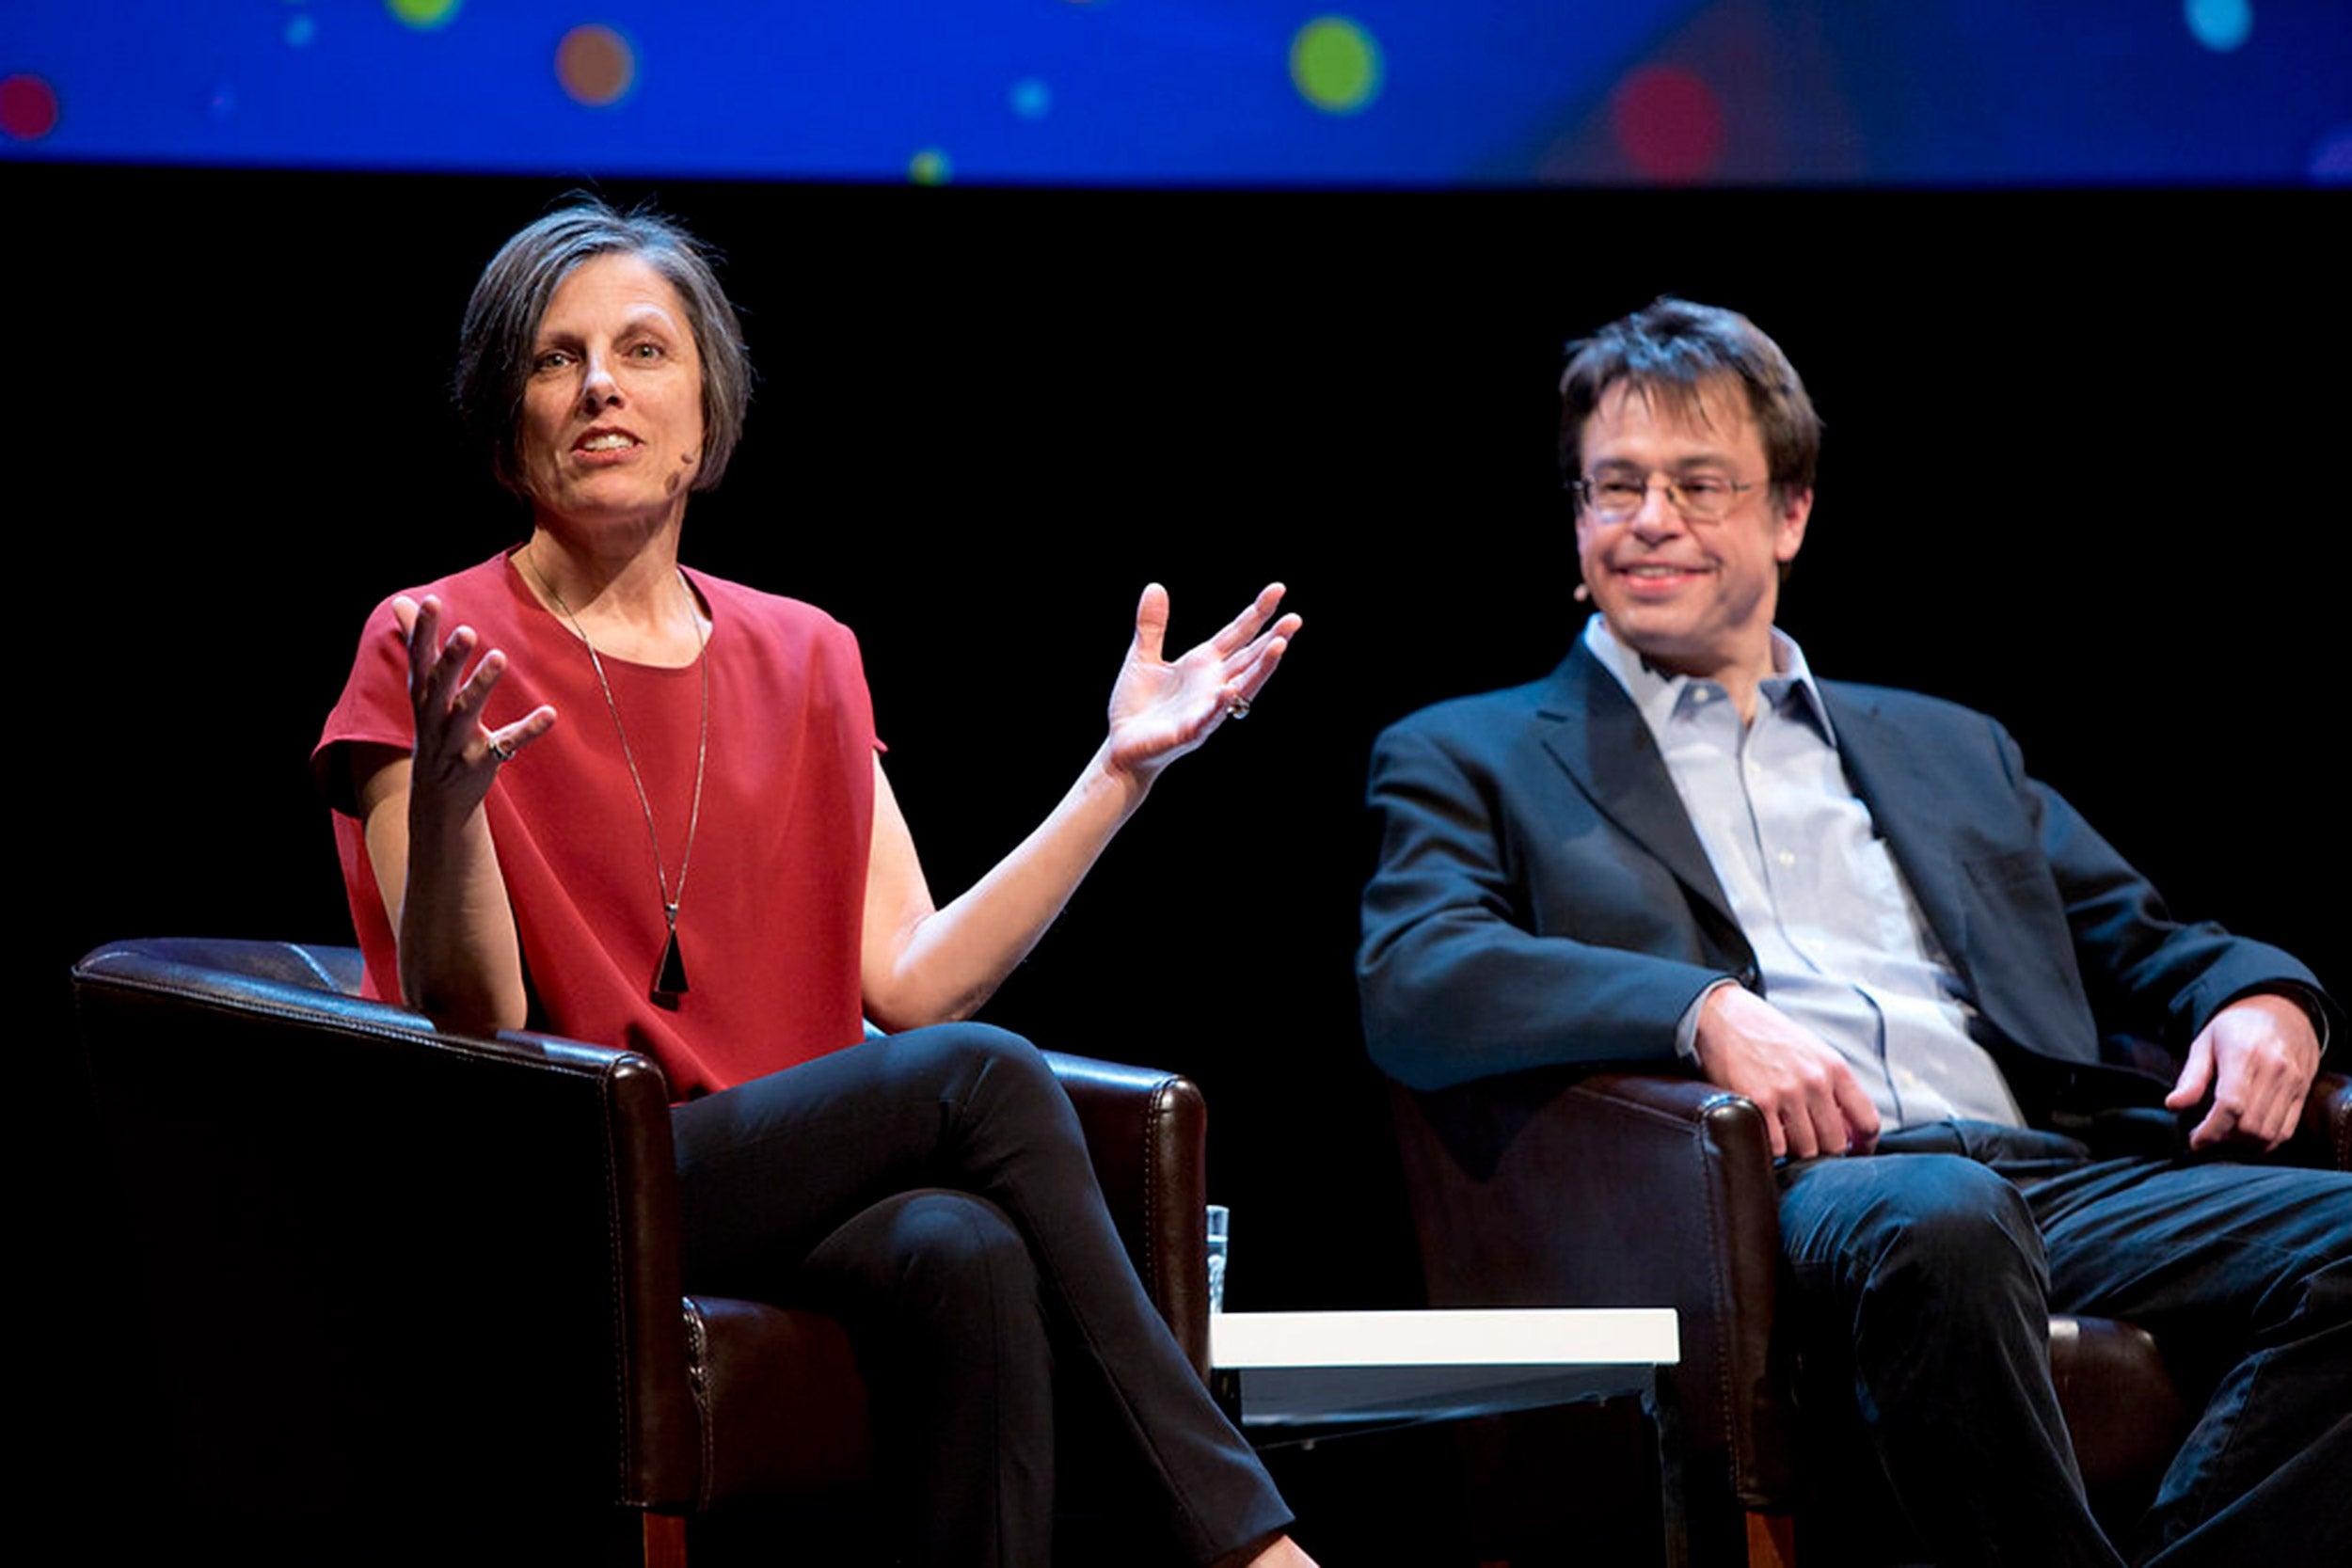 Susan M. Dymecki and Michael Puett